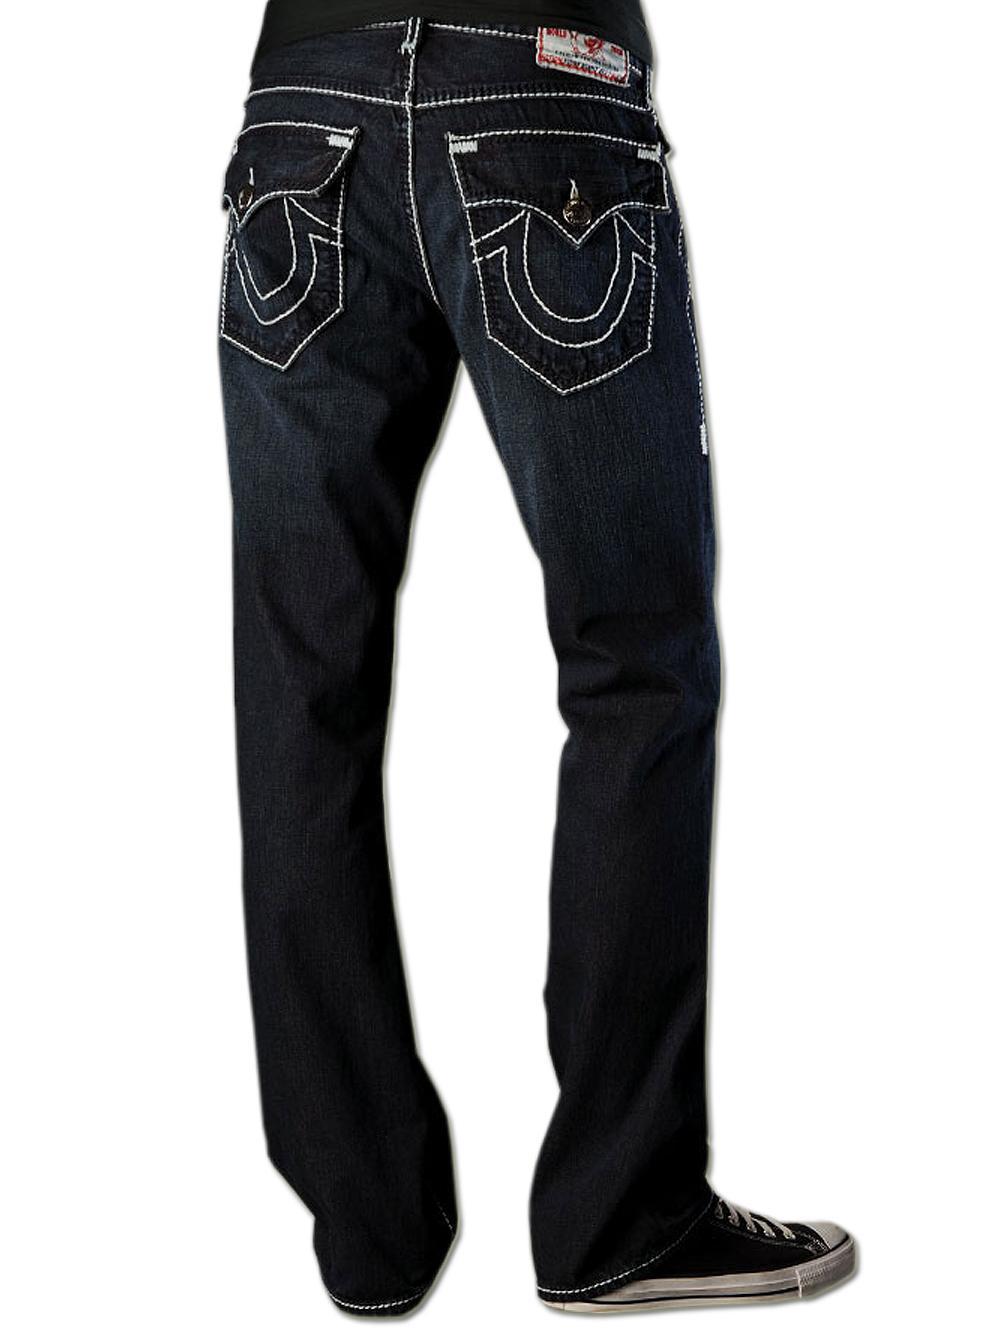 true religion herren jeans ricky giant big t true religion 3733 jeans g nstig online kaufen. Black Bedroom Furniture Sets. Home Design Ideas